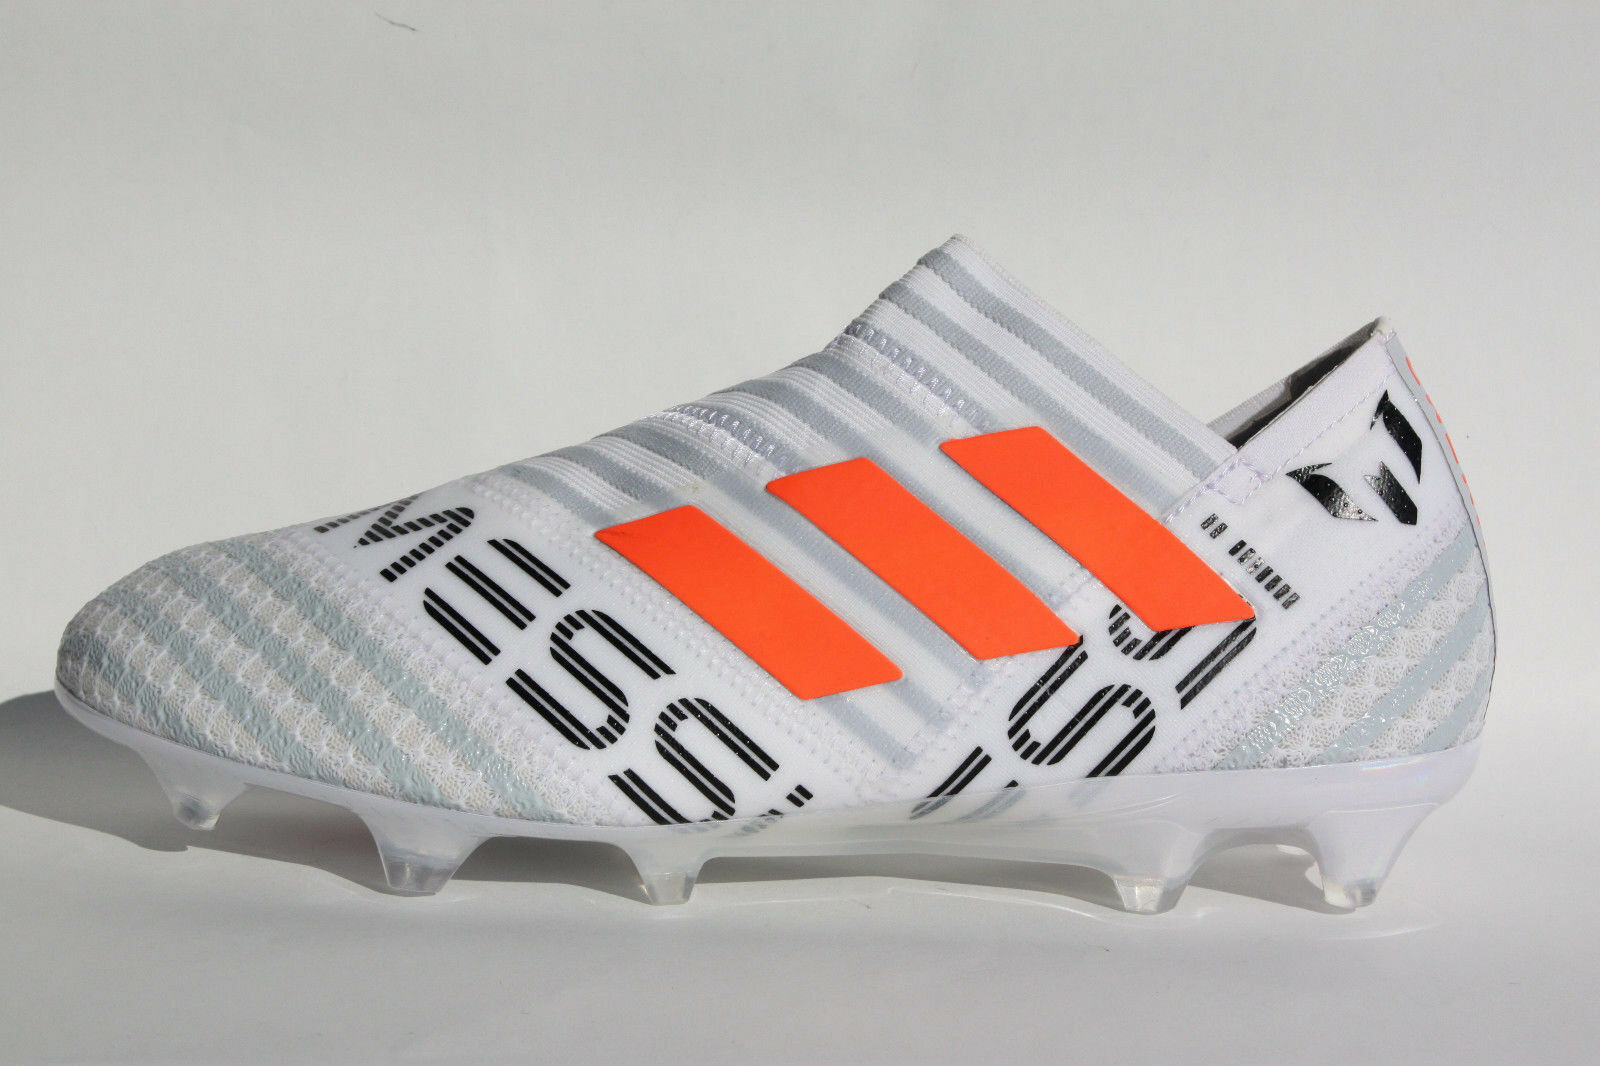 Adidas Nemeziz 17+360 Agility BY2402  Messi Retail  320.00 HOT SALE    224.00